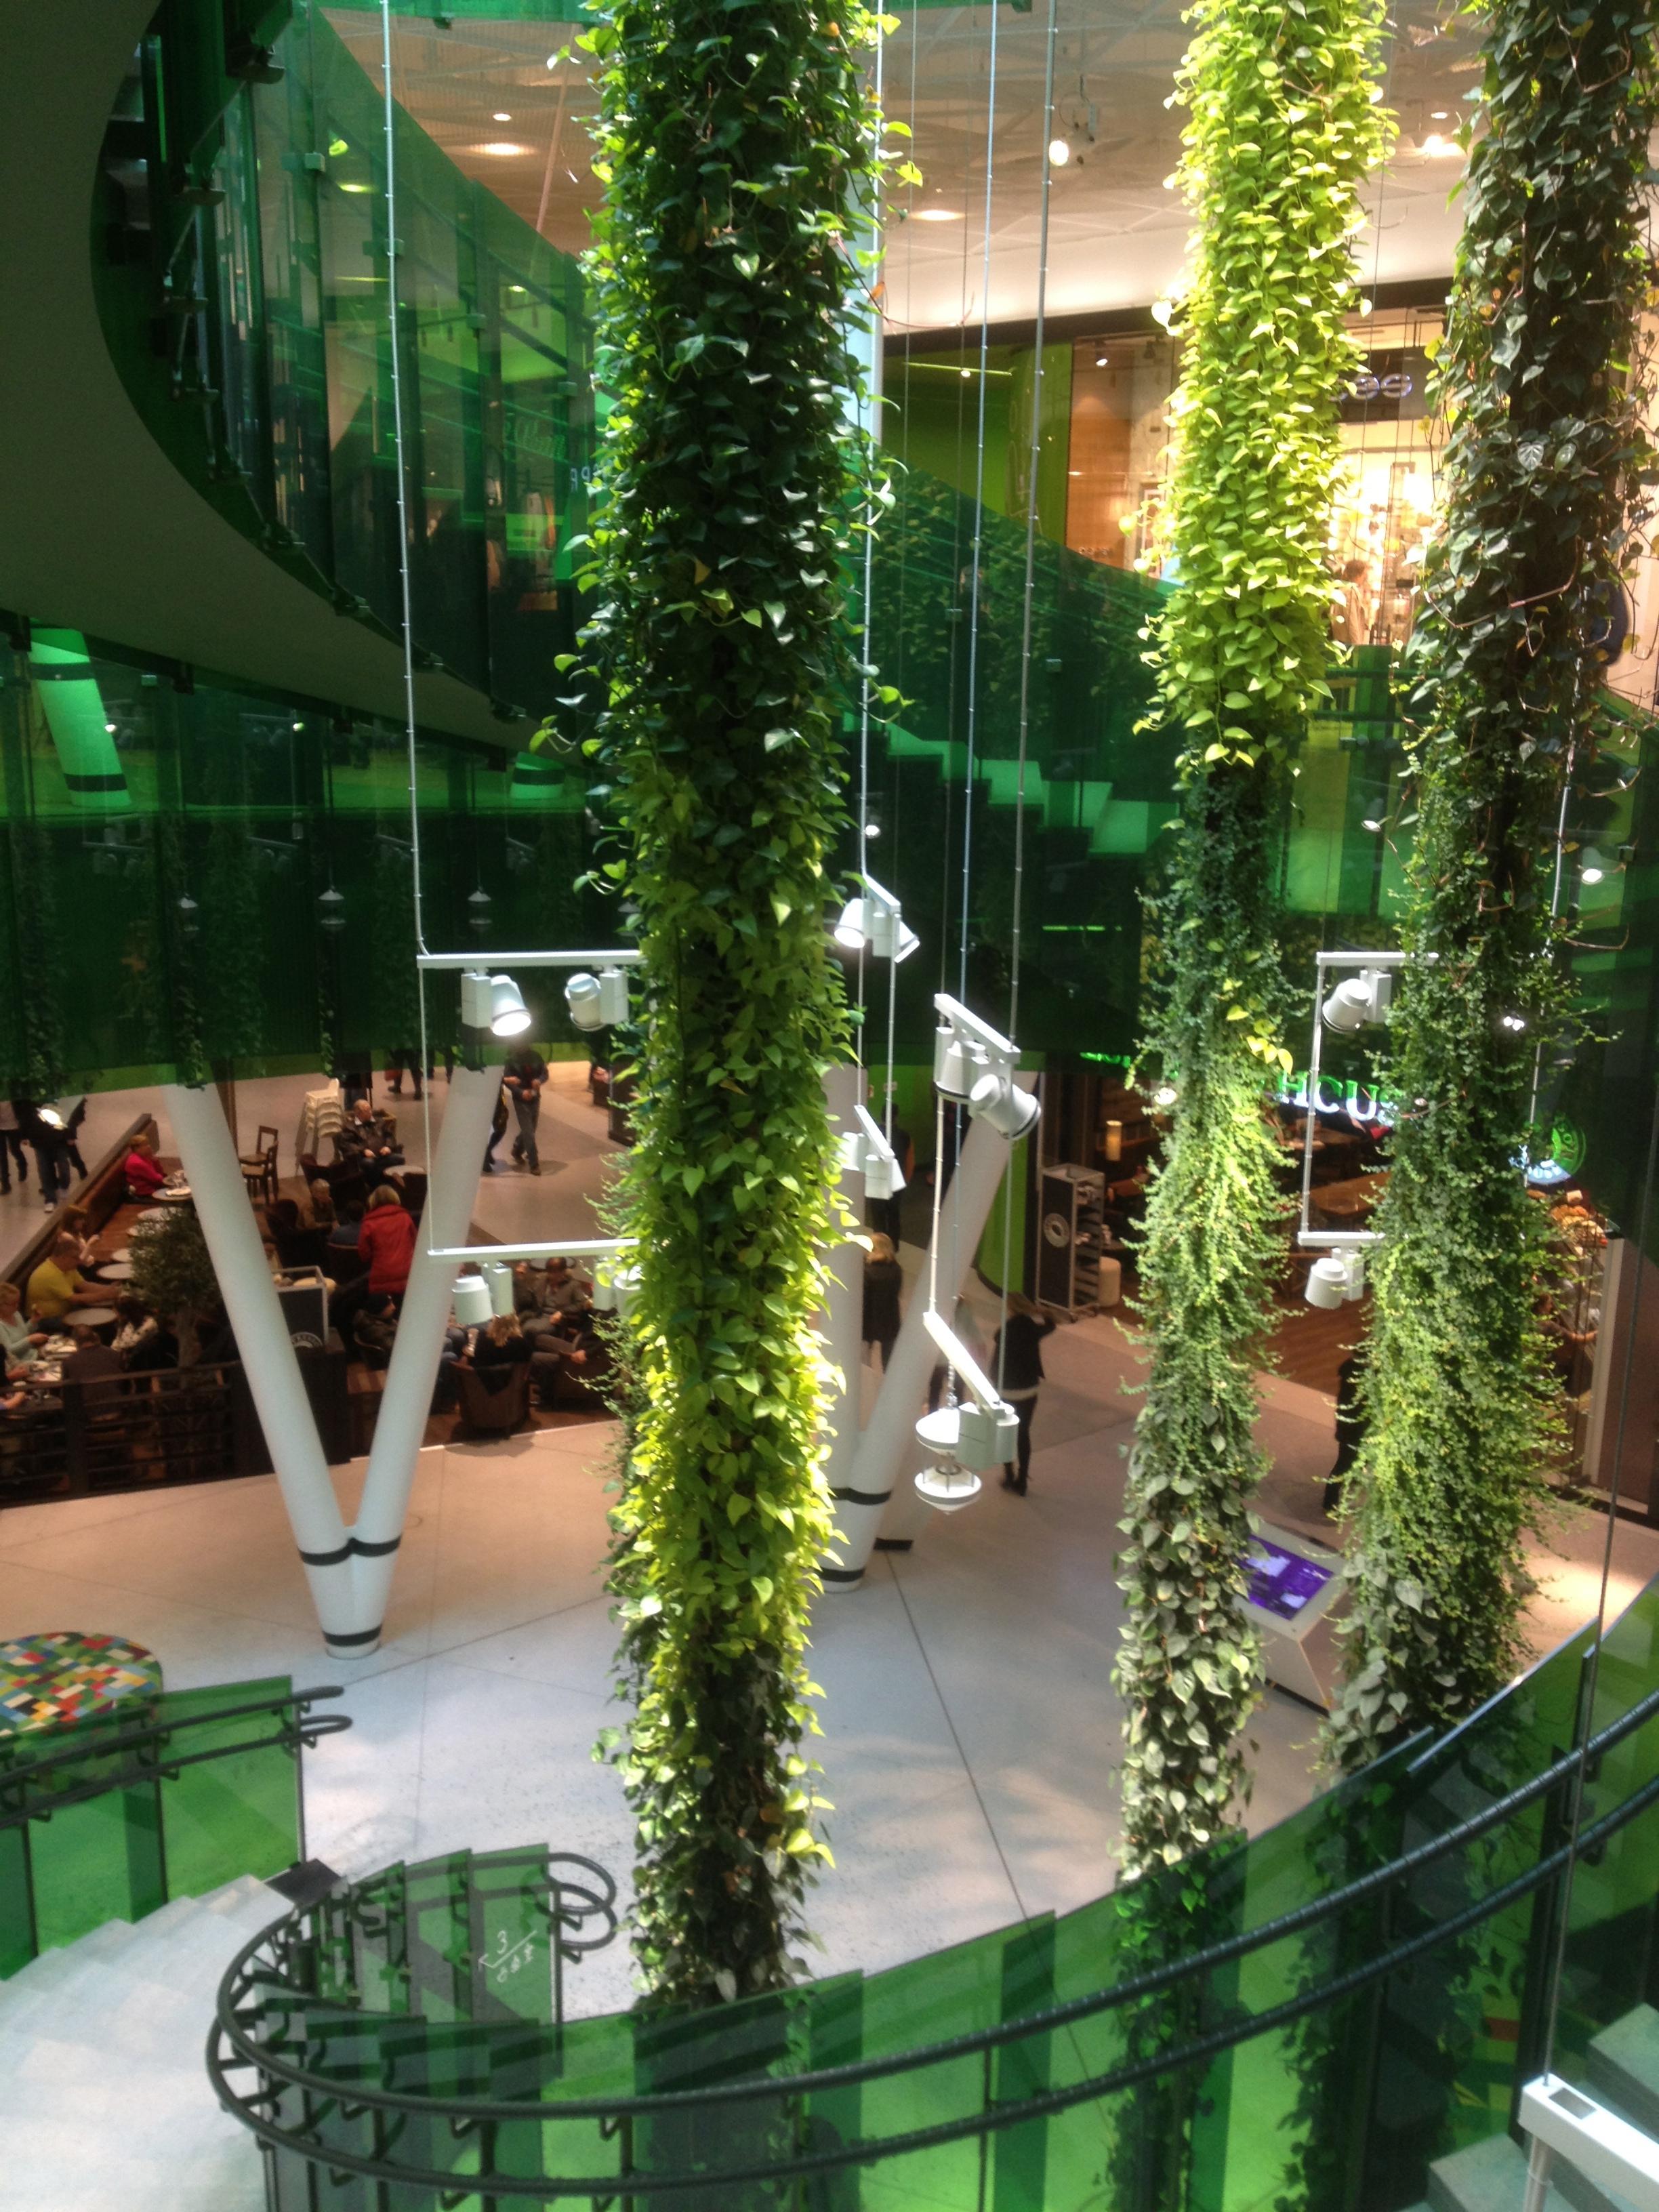 Fond d 39 cran jardin vert design d 39 int rieur achats for Achat plante jardin